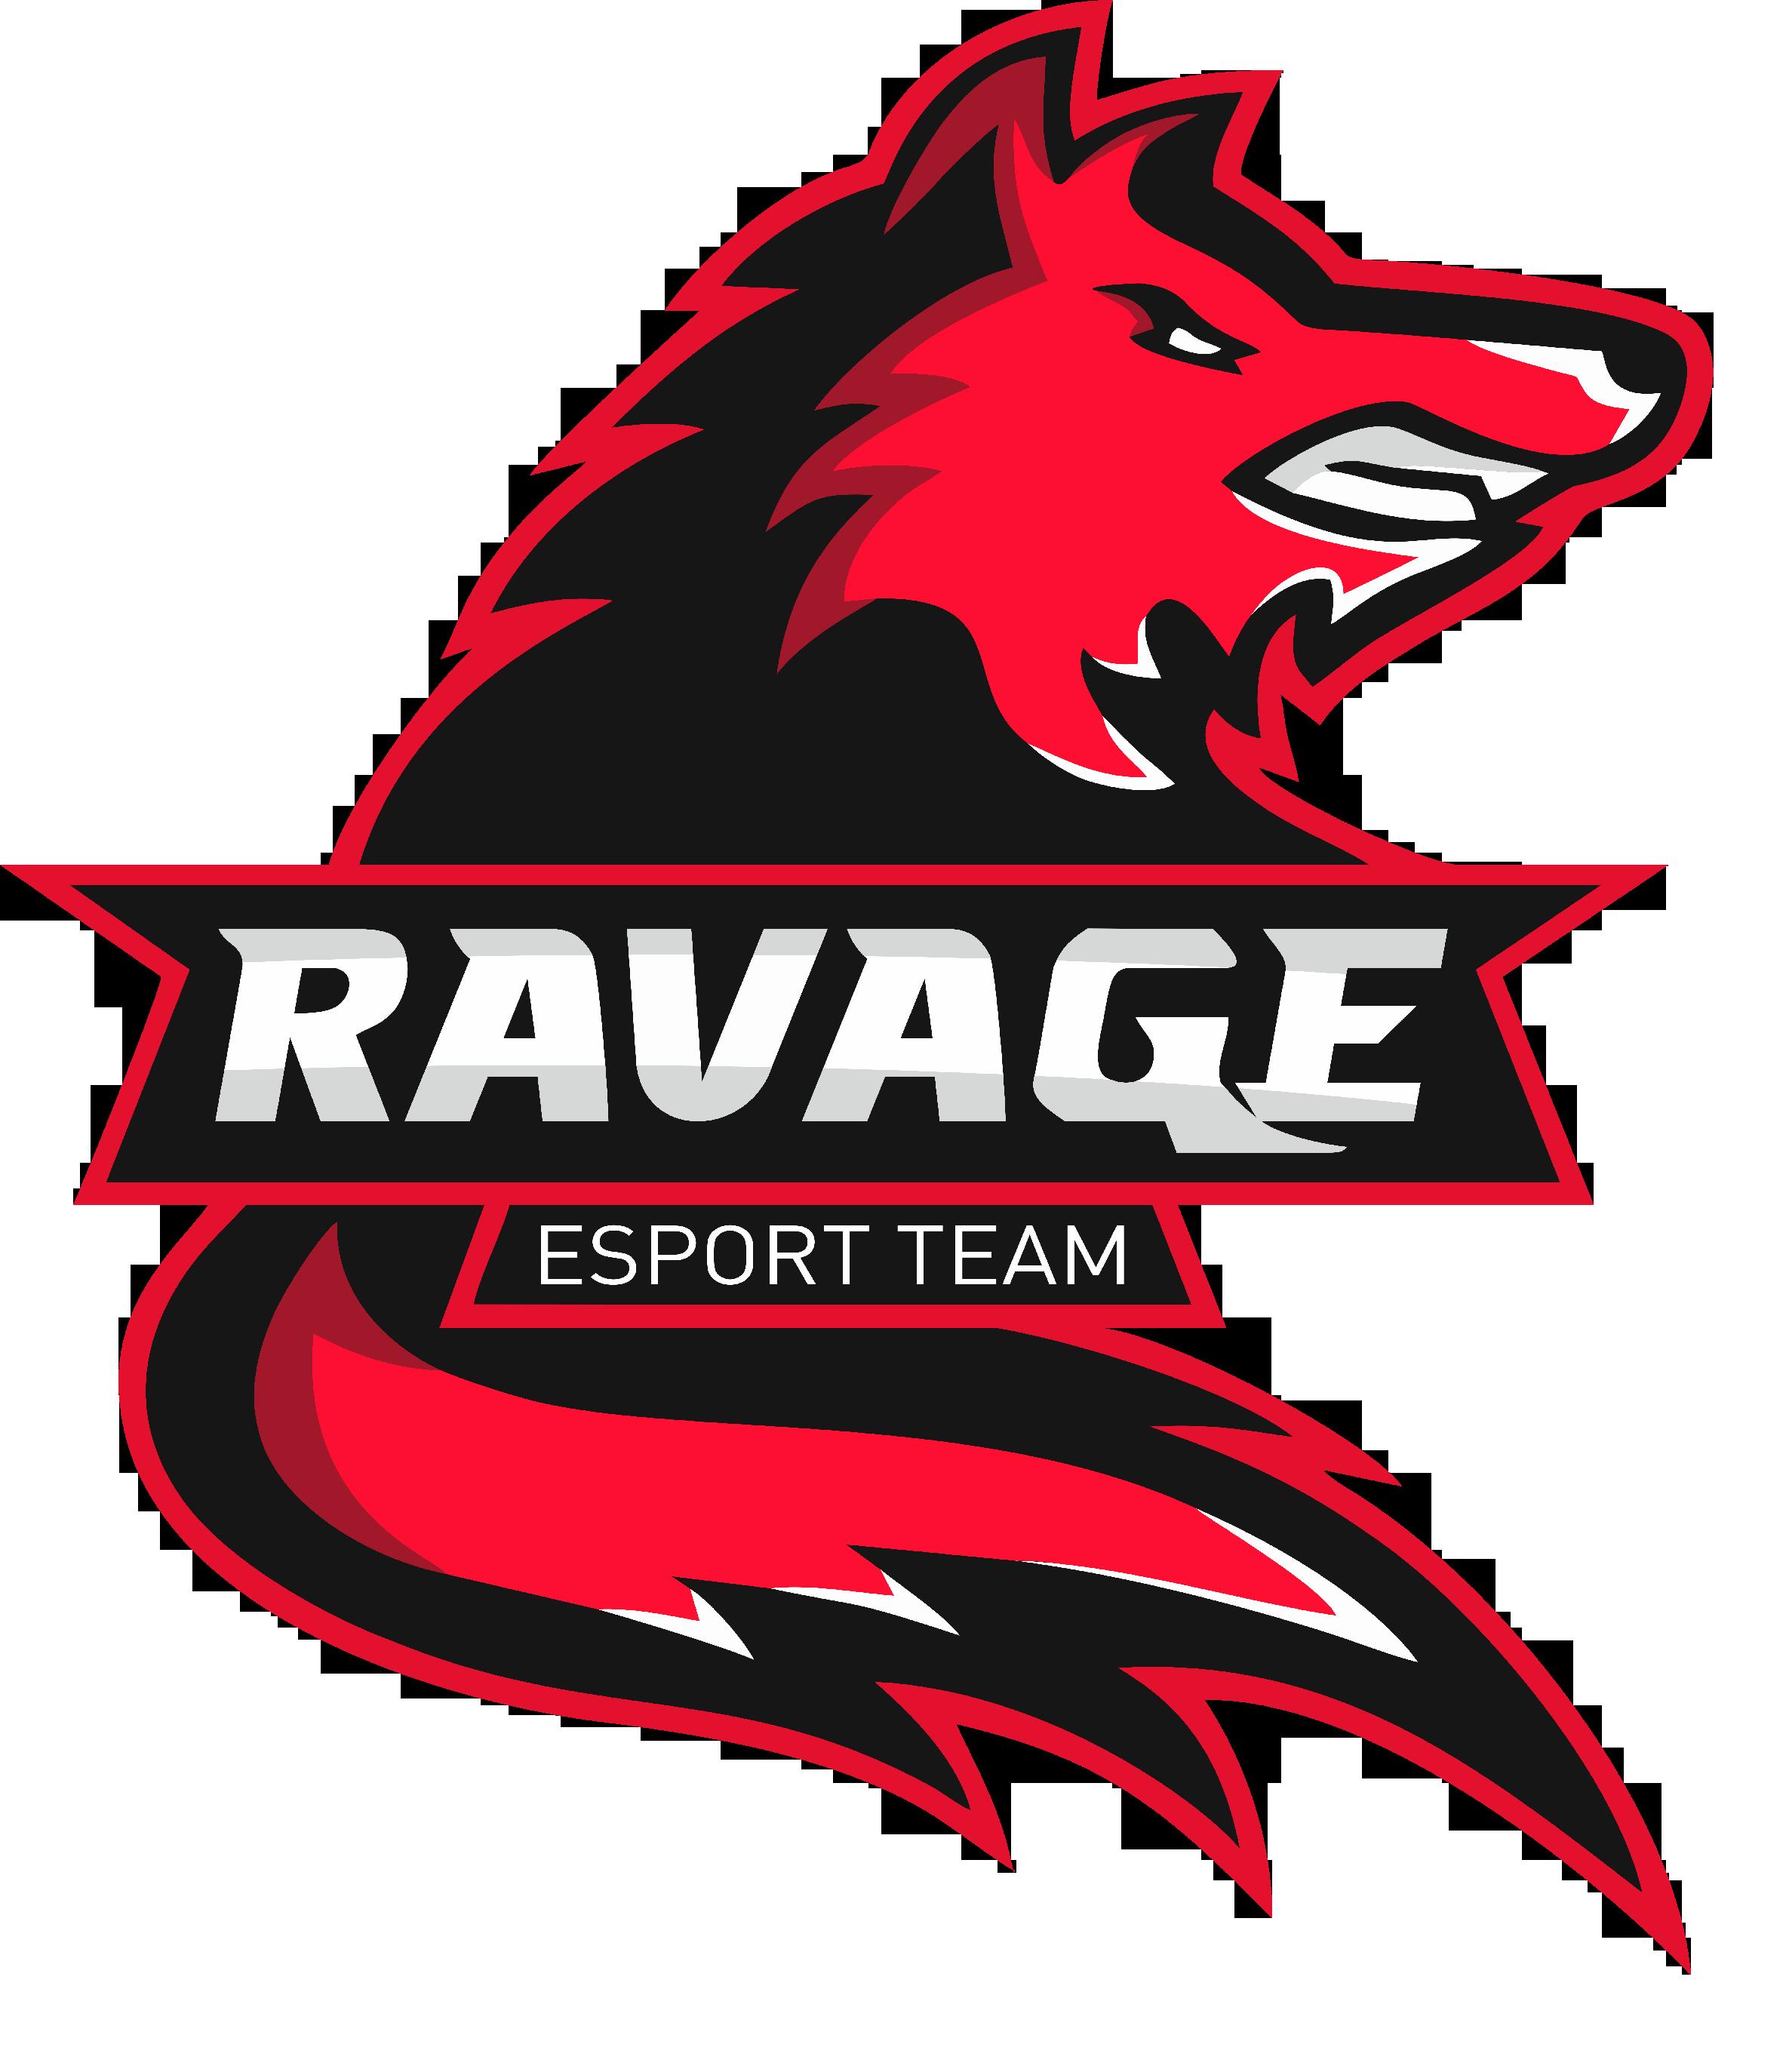 Ravage.eSports